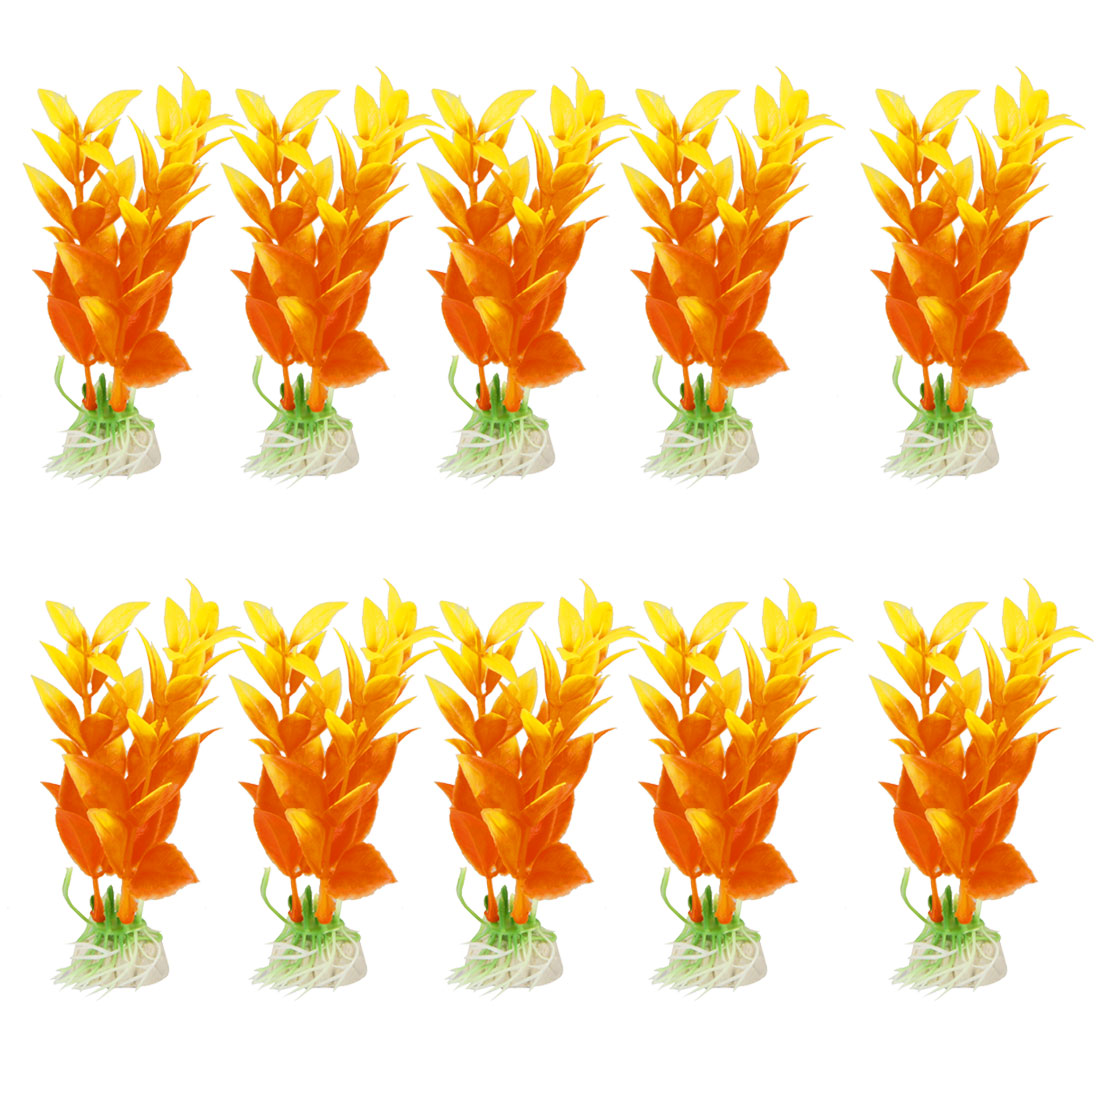 "10 Pcs 3.5"" High Orange Aquarium Aquascaping Simulation Aquatic Grass Decor"